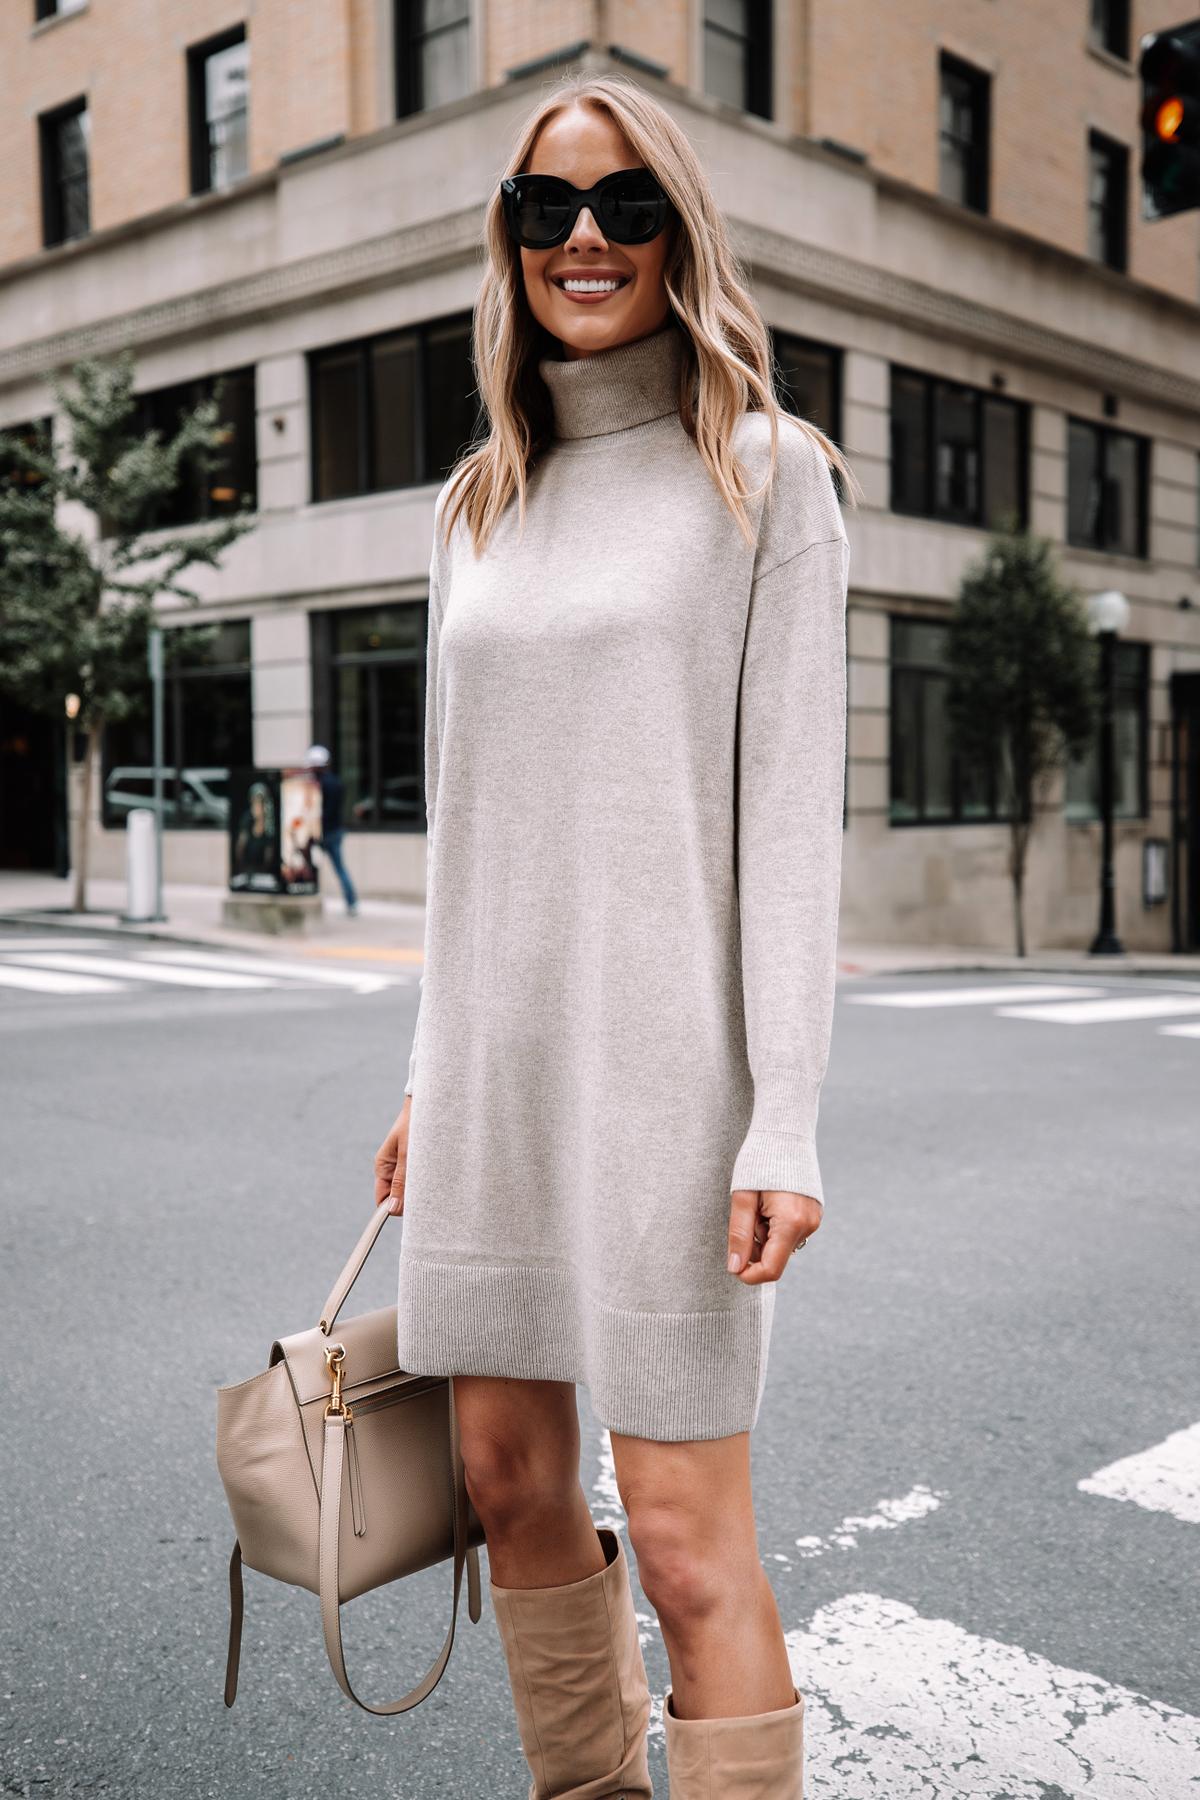 Fashion Jackson Wearing Everlane Beige Turtleneck Sweater Dress Tan Knee High Boots